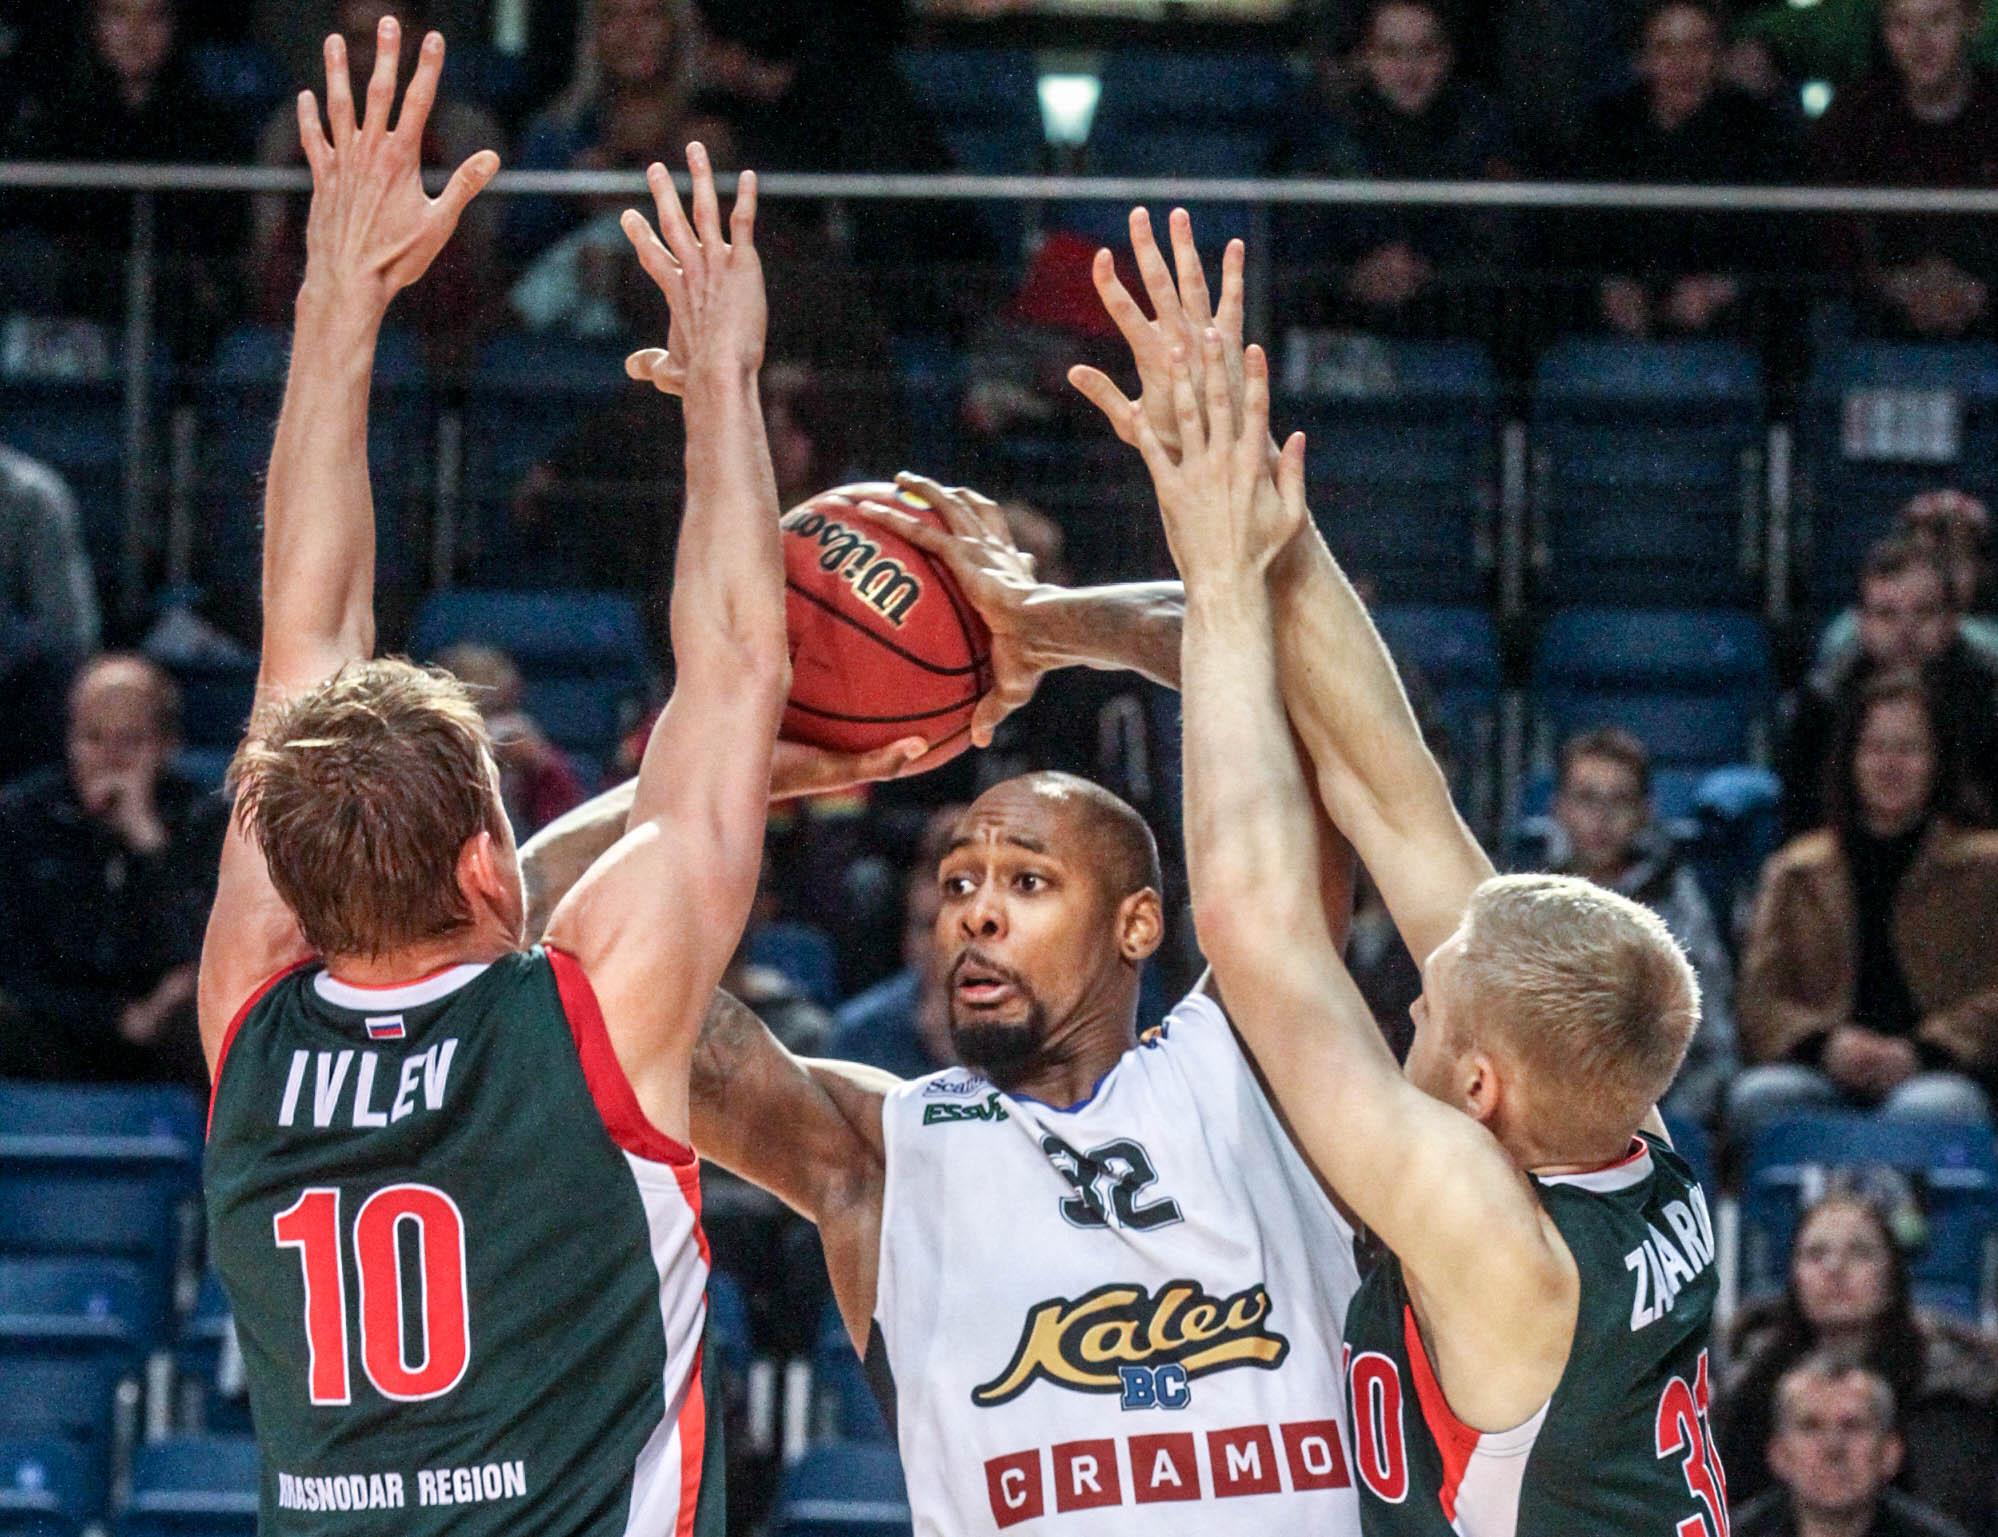 Krasnodar Overwhelms Kalev For 10th Straight Win